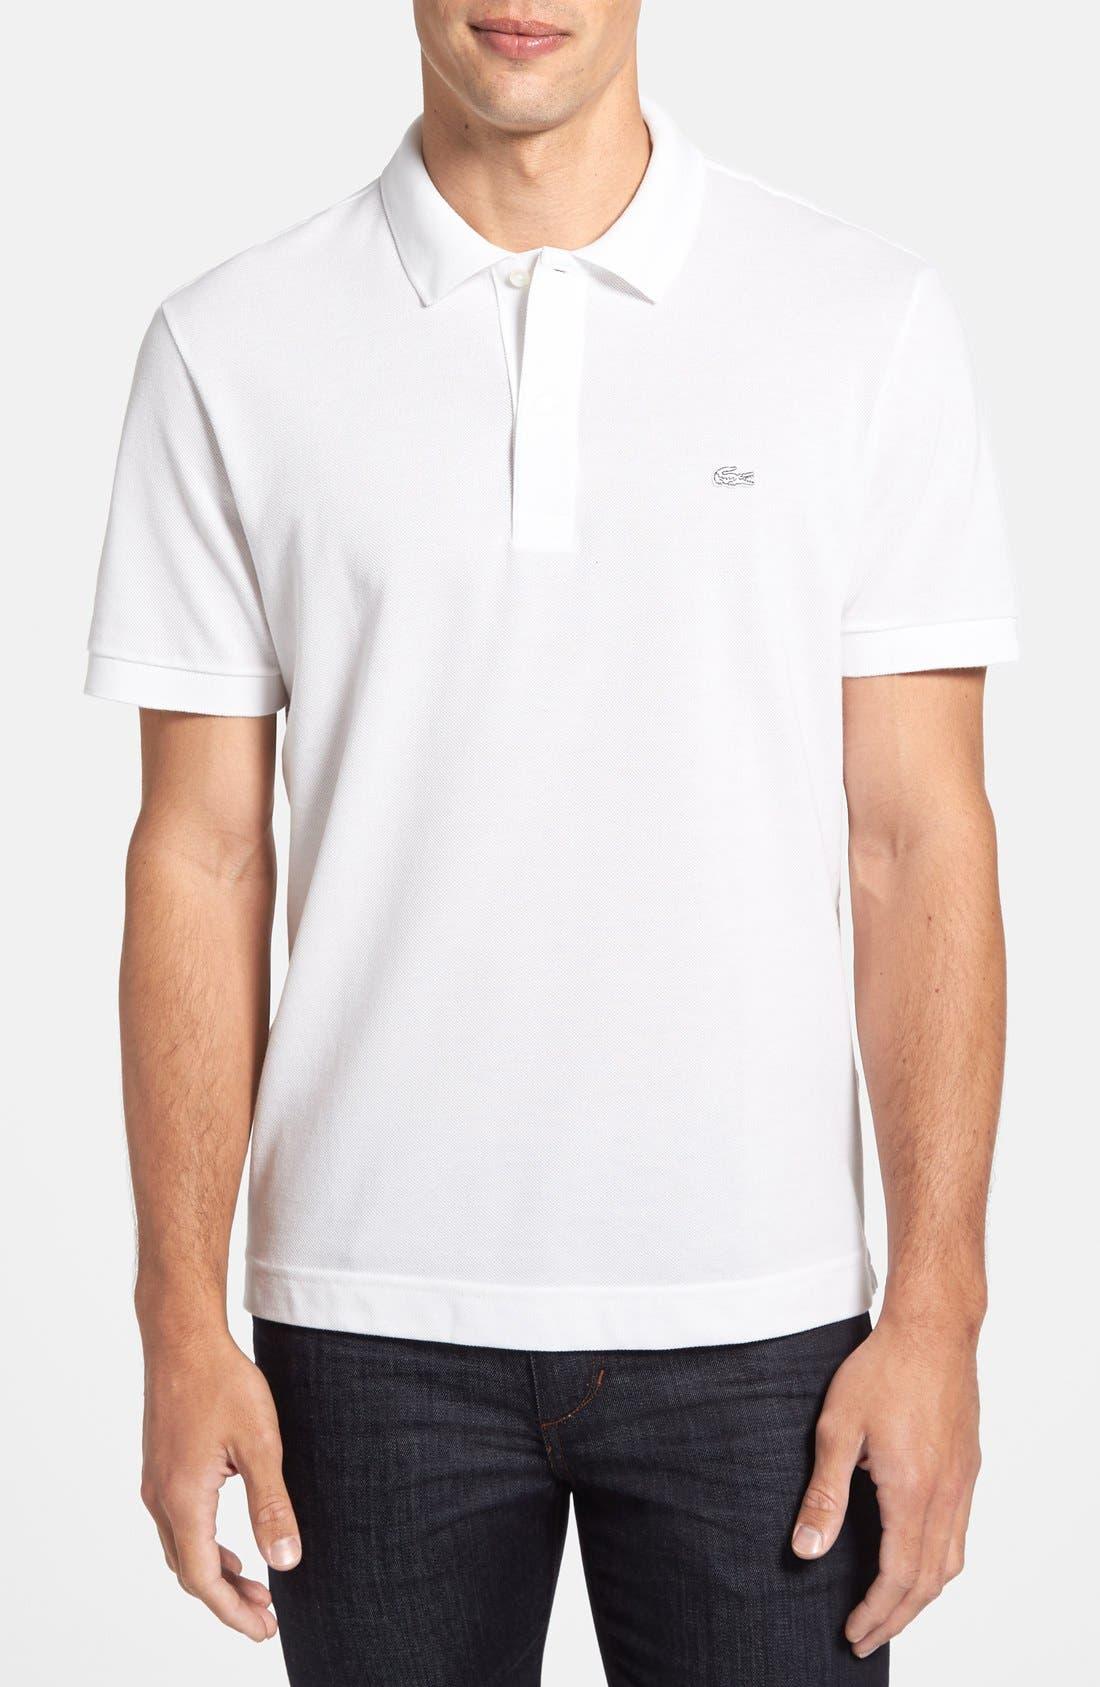 Alternate Image 1 Selected - Lacoste 'White Croc' Regular Fit Piqué Polo